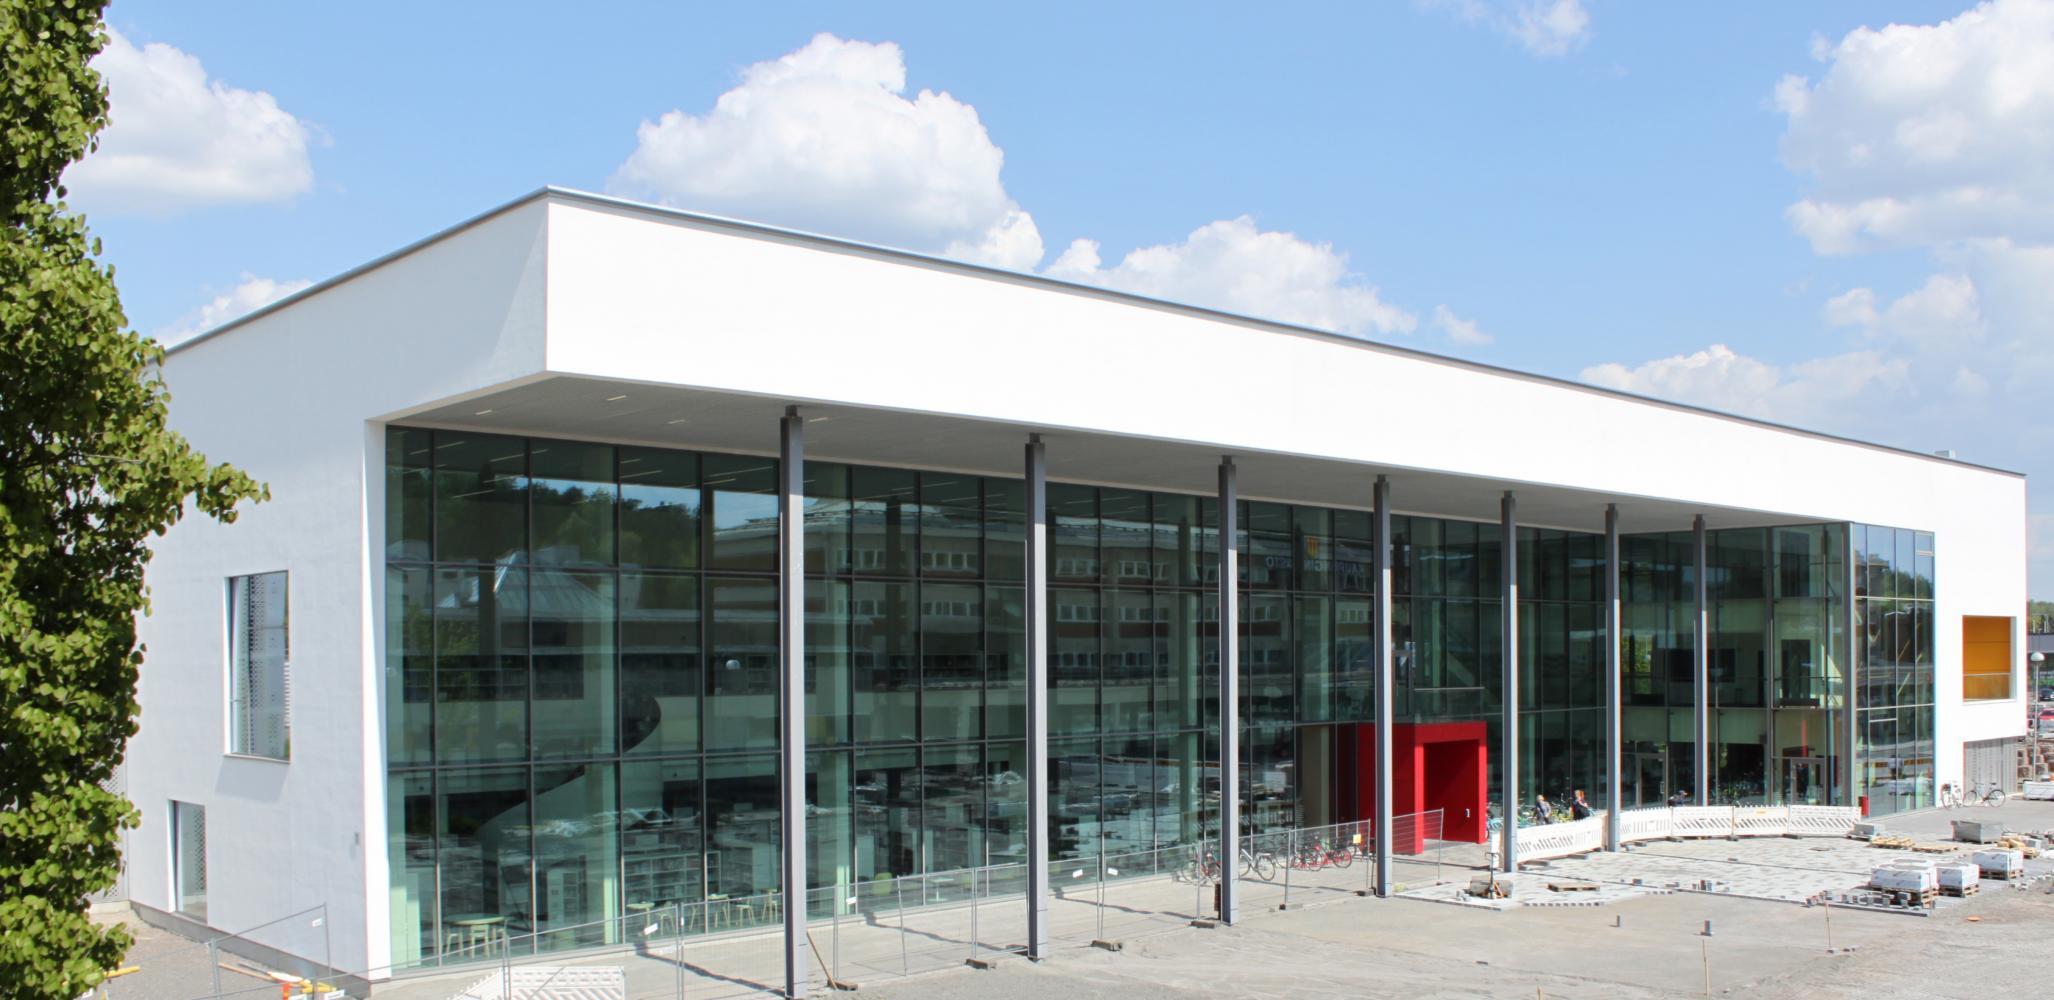 S:t Karins huvudbibliotek